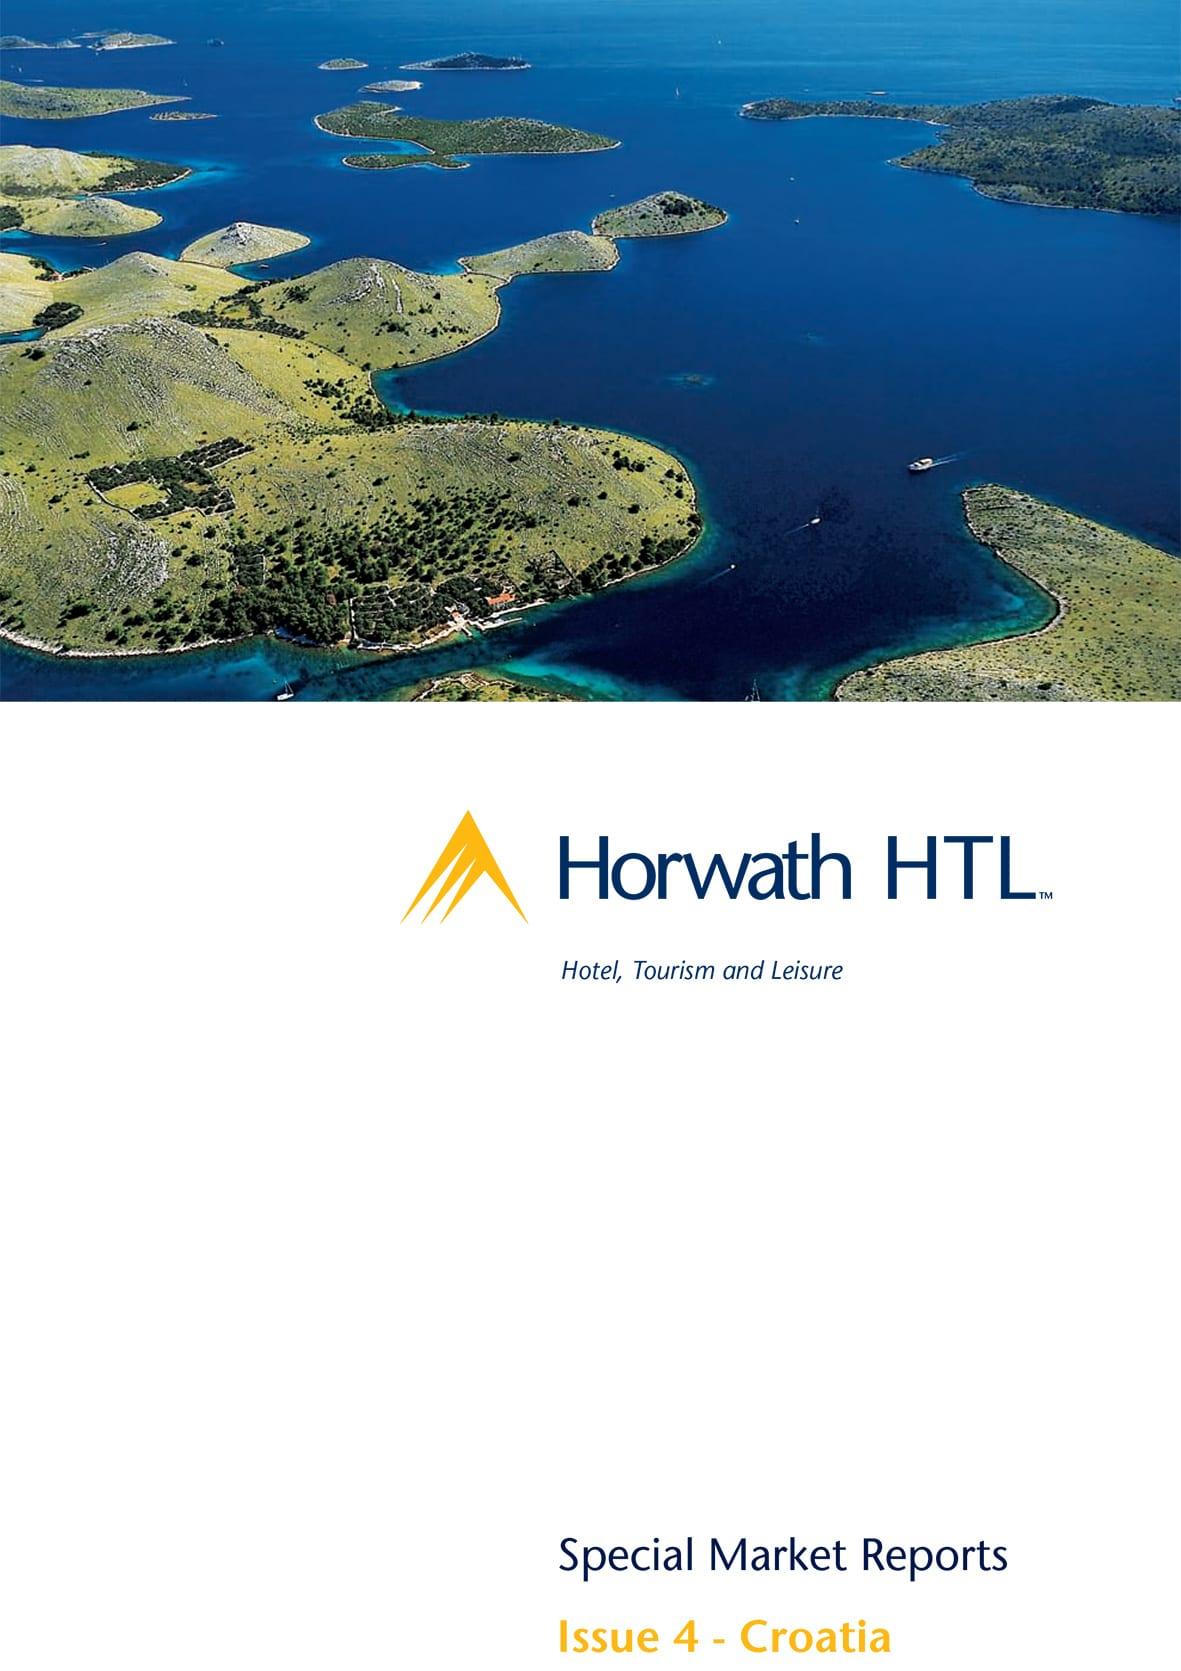 Horwath HTL Market Report 4 Croatia 1 1